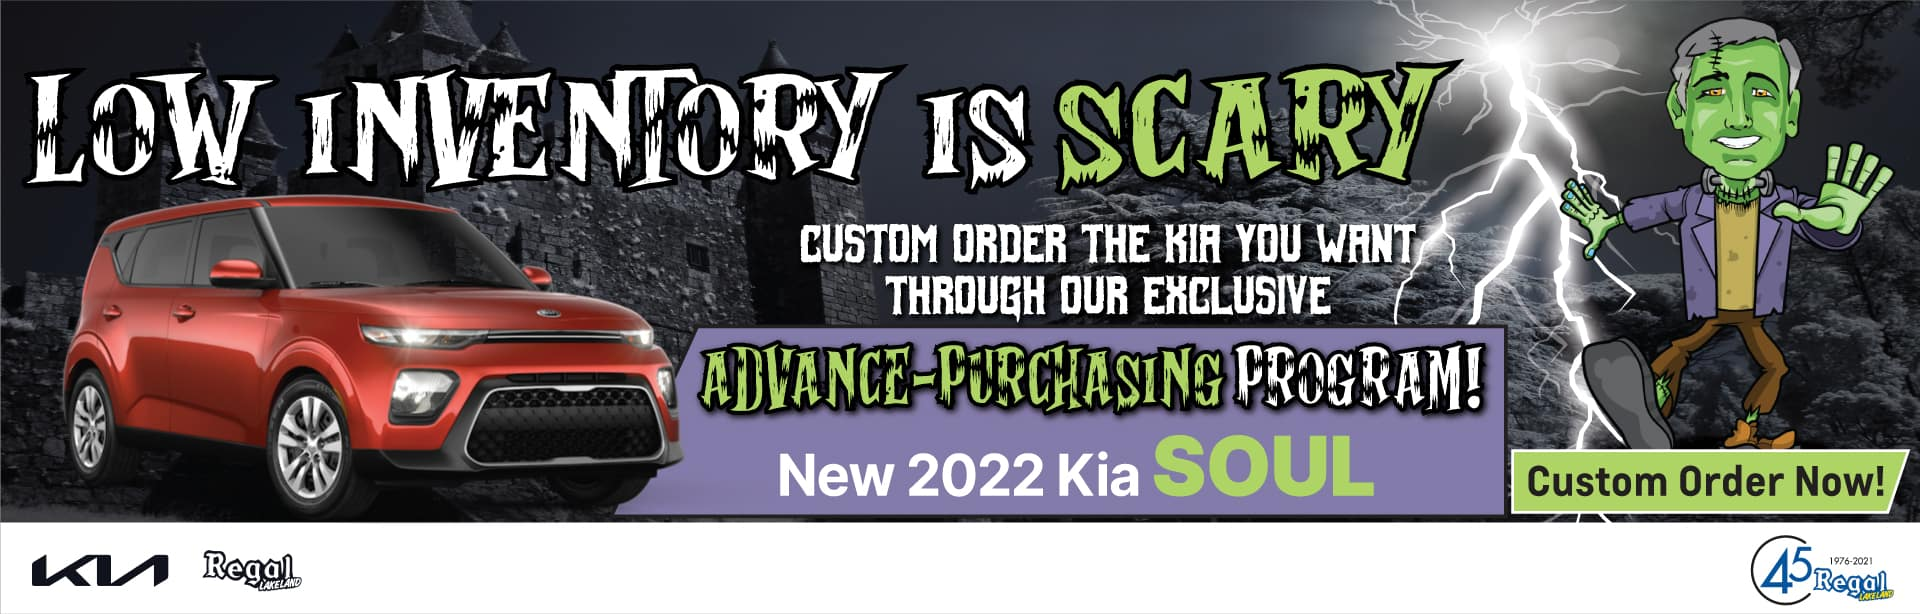 RAKP70758-1-KB_Scary_Soul_desktop_oct21